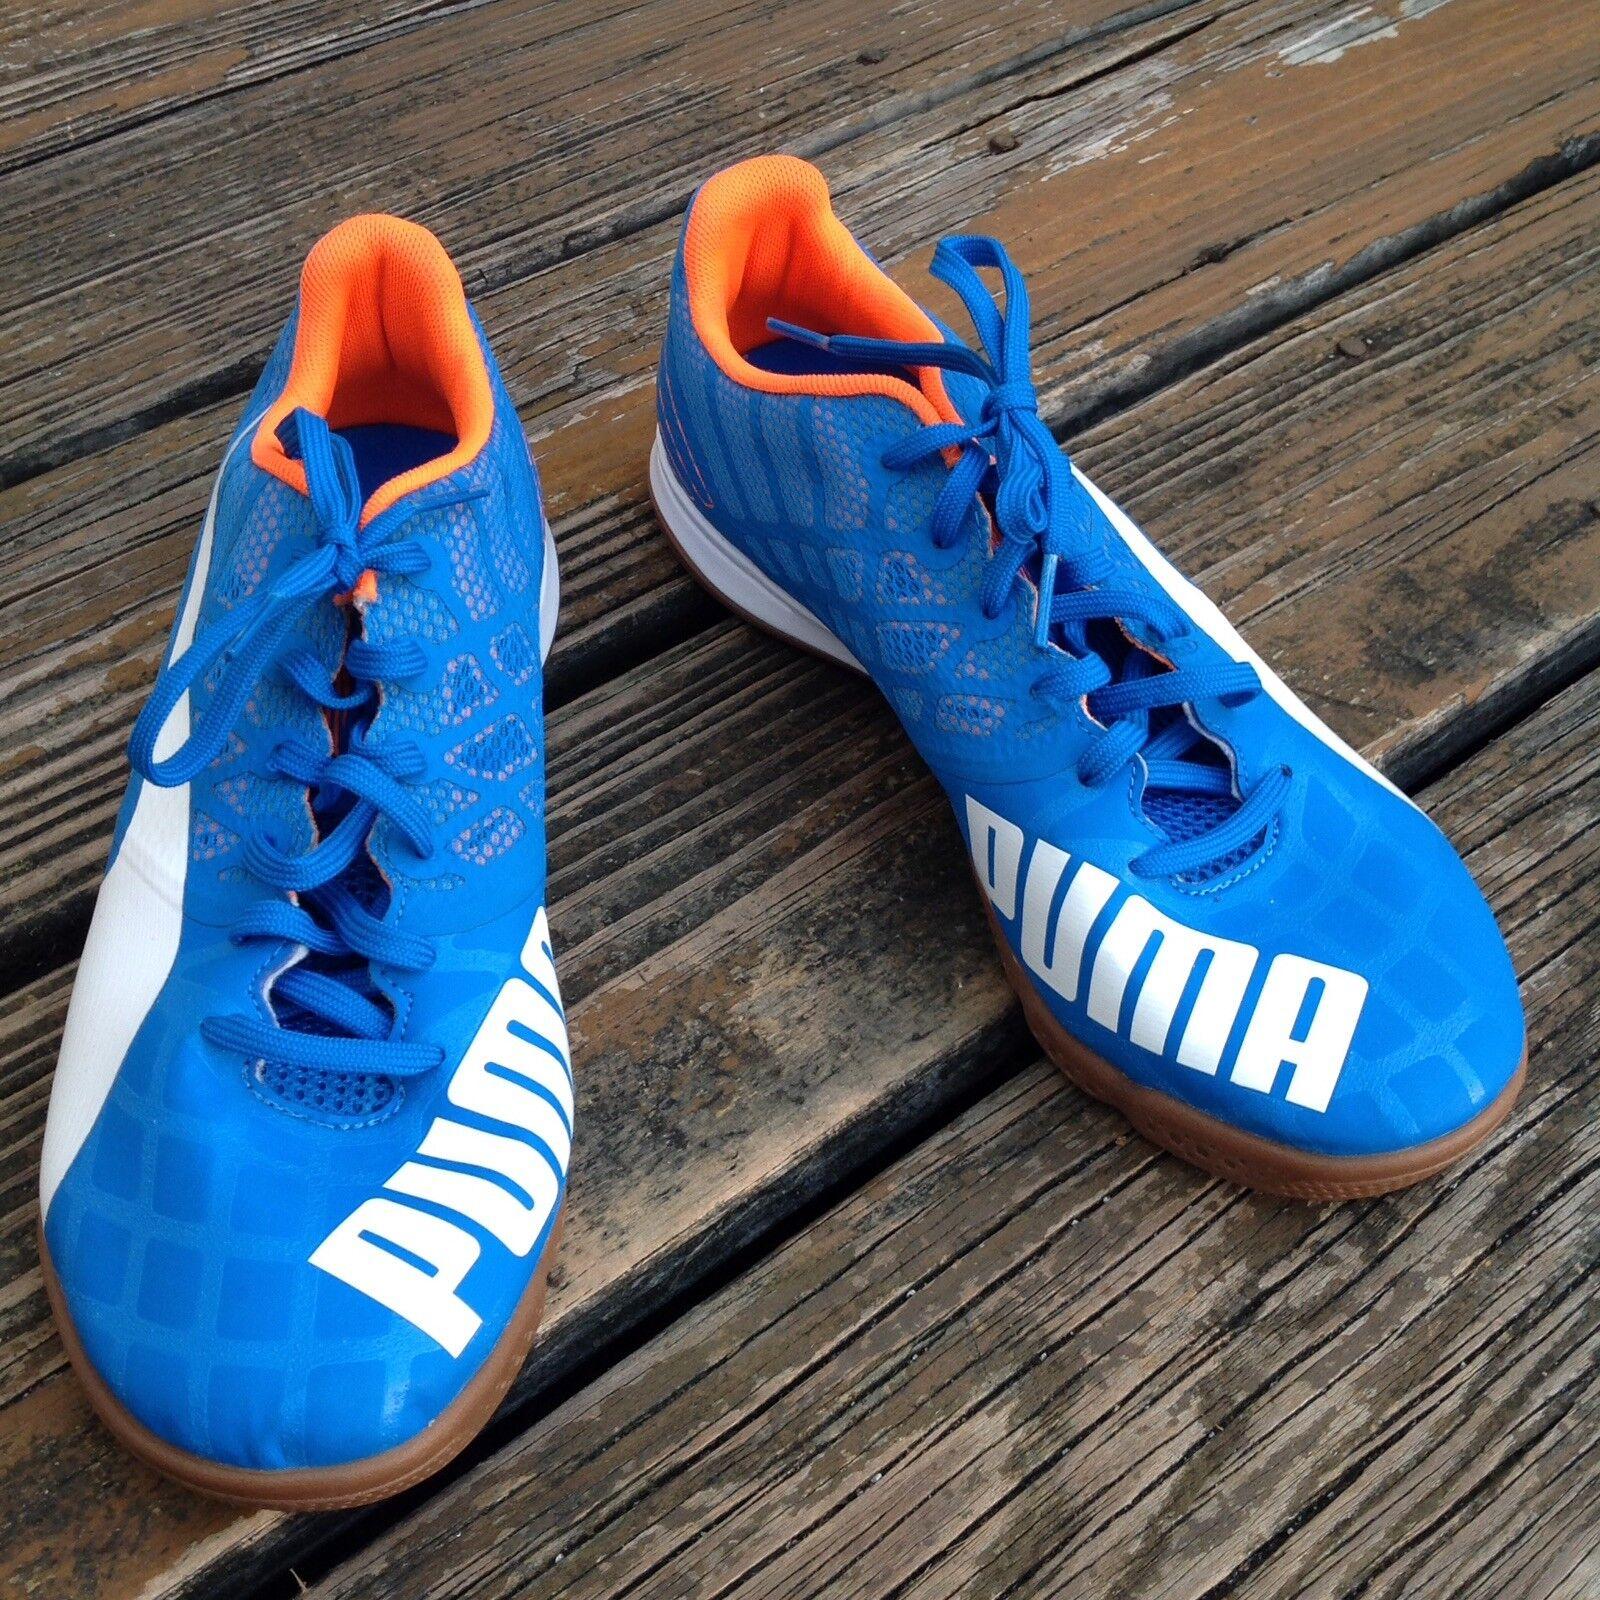 Puma Royal bluee orange White Sneakers Mens Sz 9.5 Athletic shoes